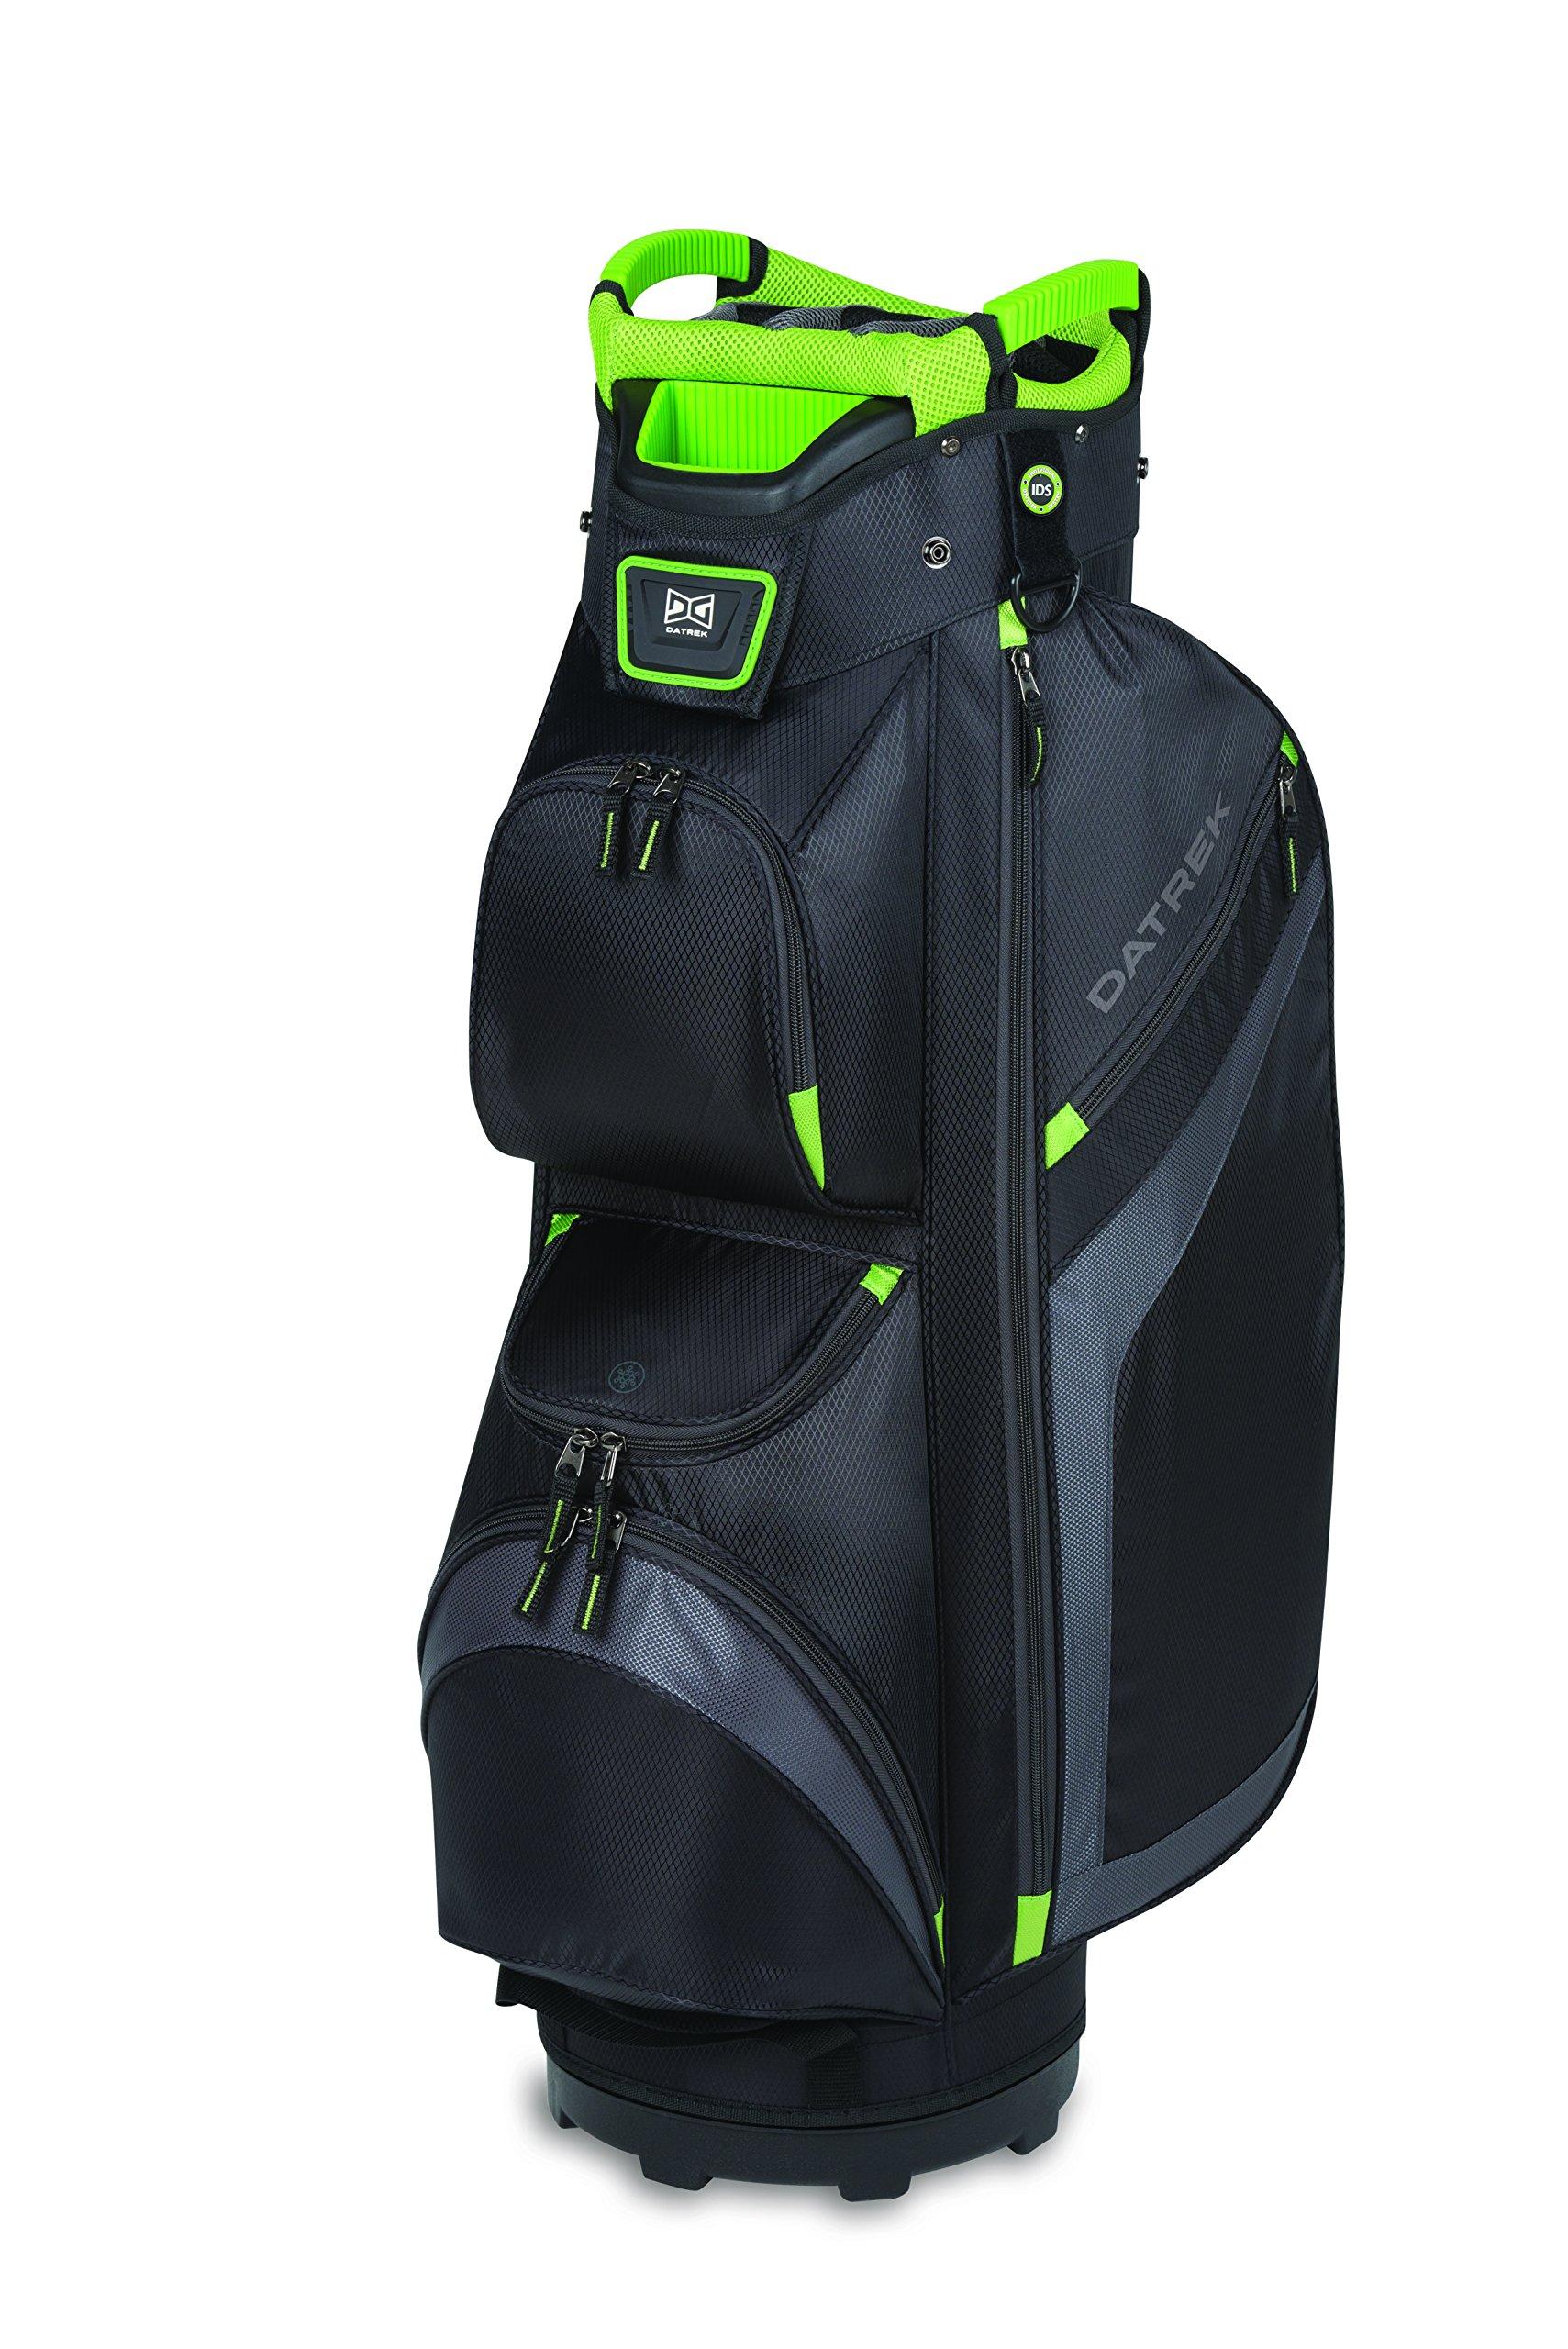 Datrek DG Lite II Cart Bag Black/Charcoal/Lime DG Lite II Cart Bag by Datrek